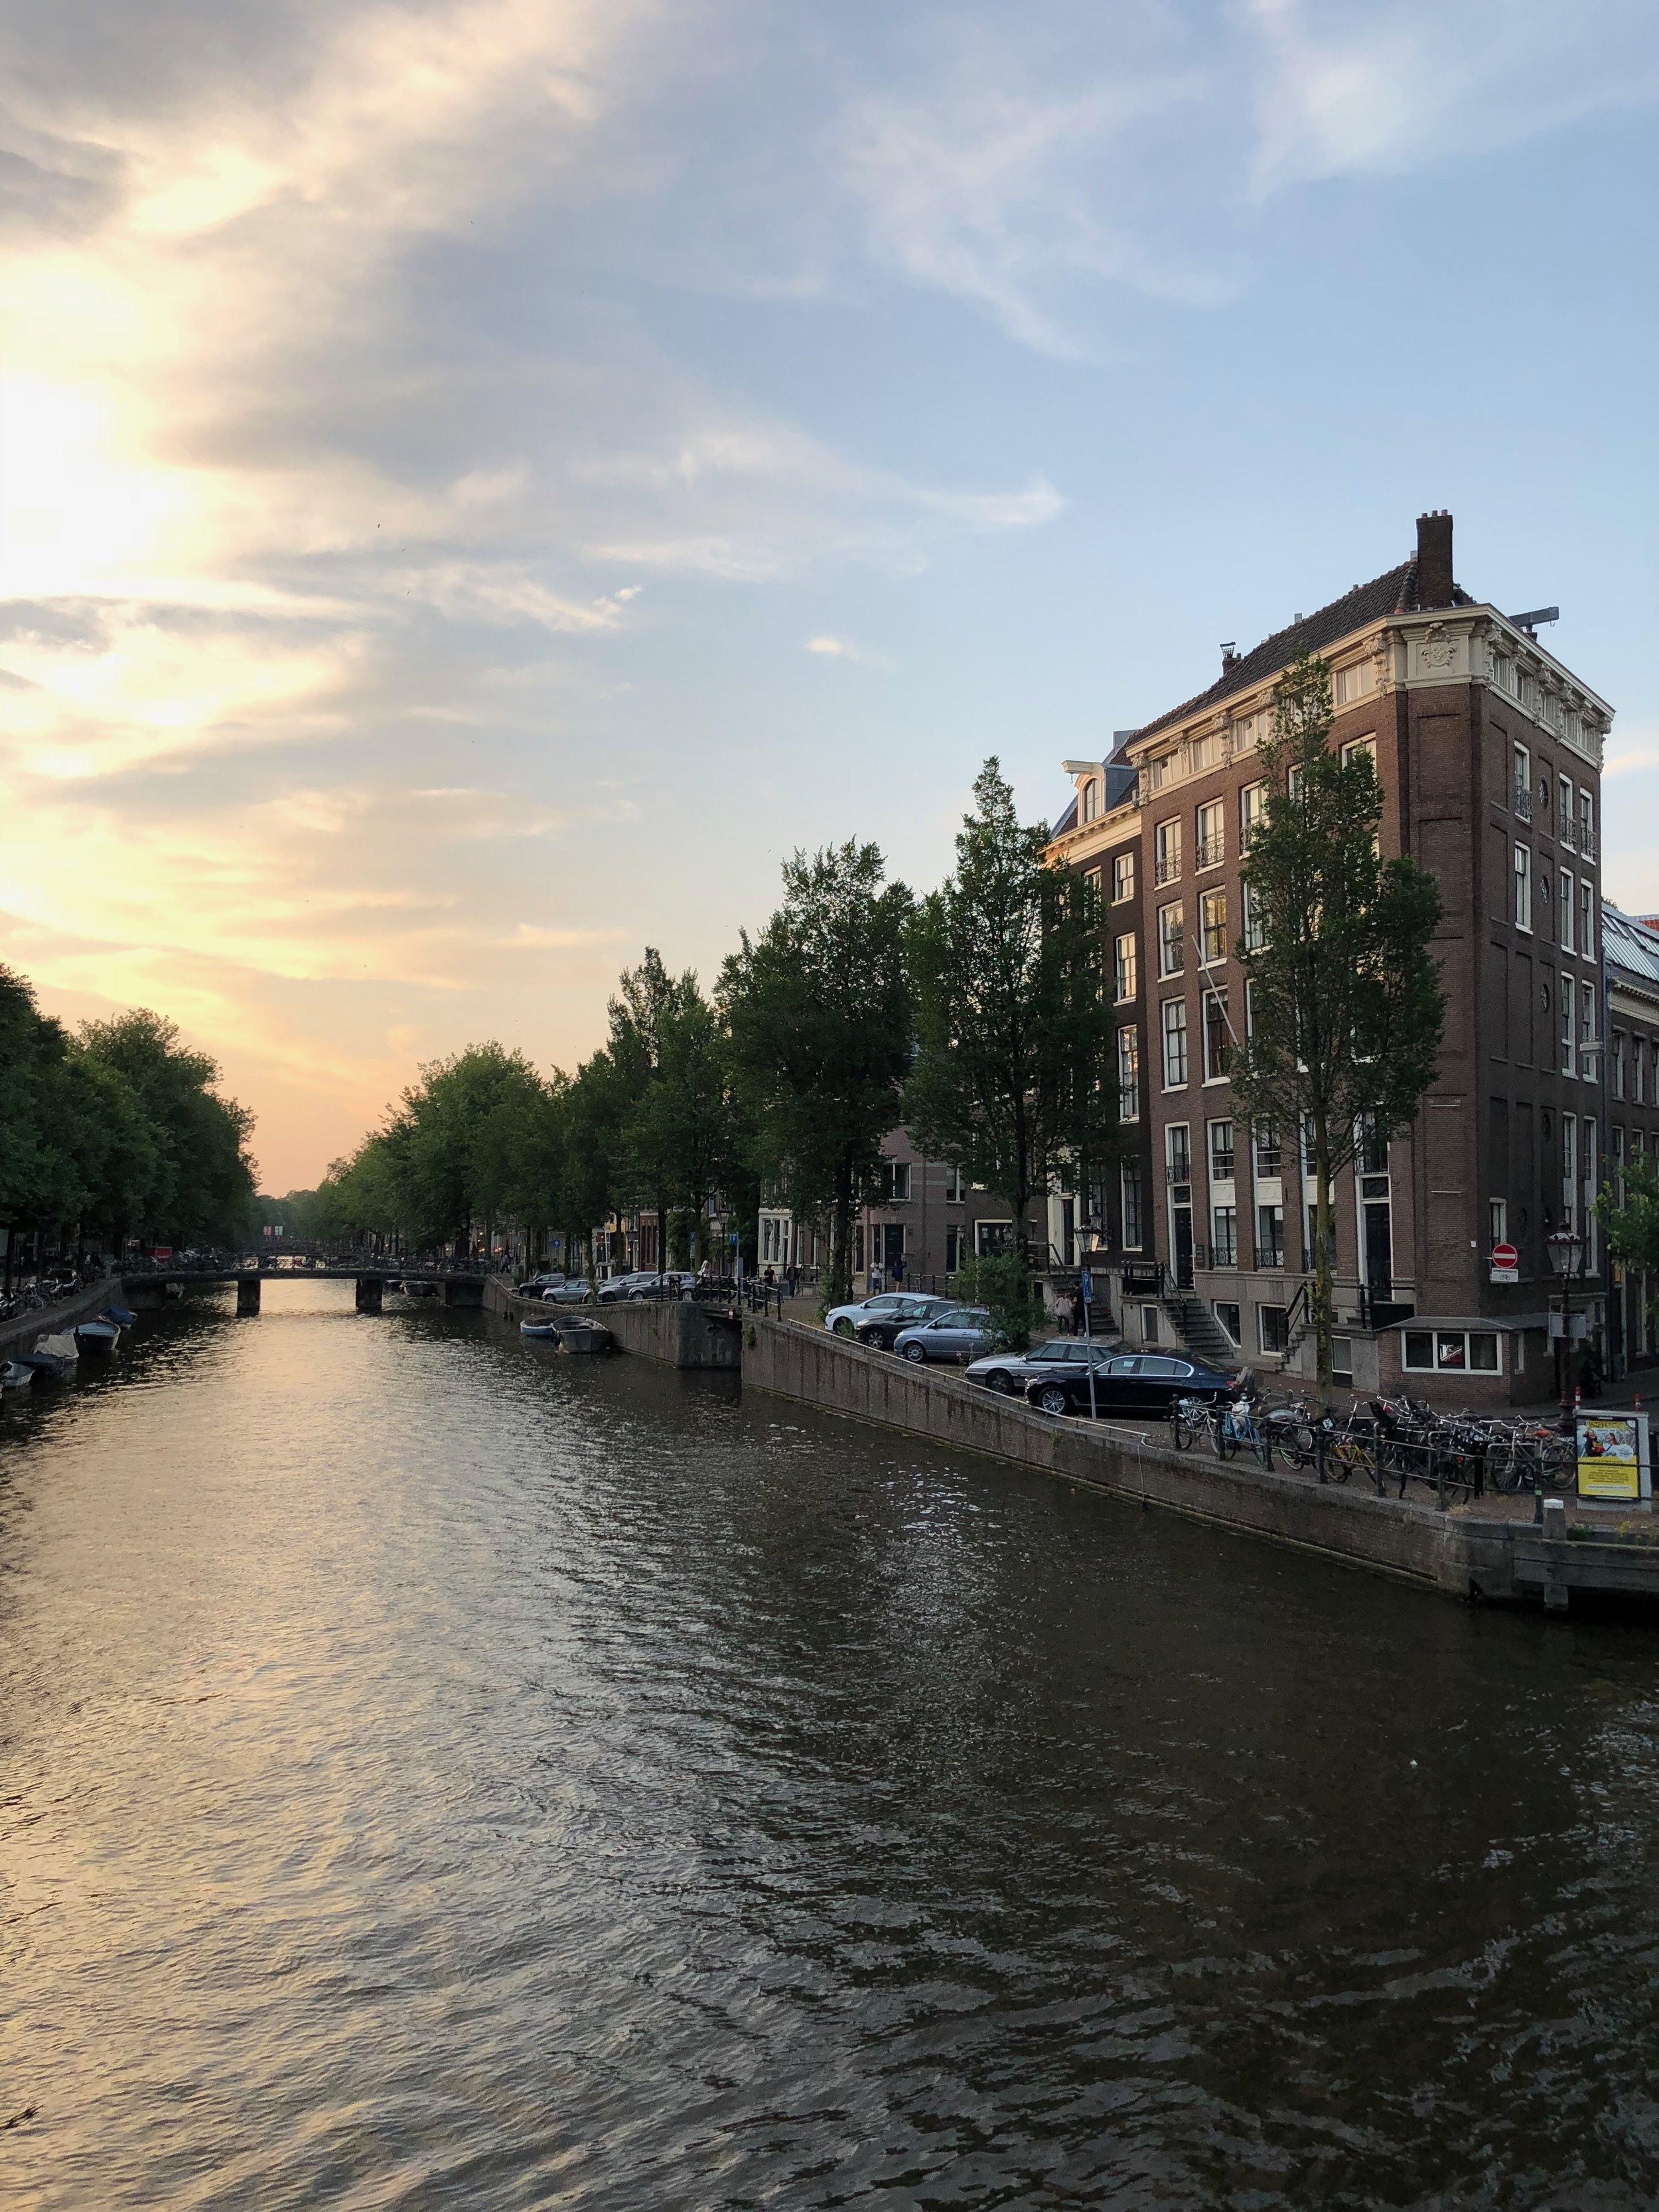 Amsterdam at dusk